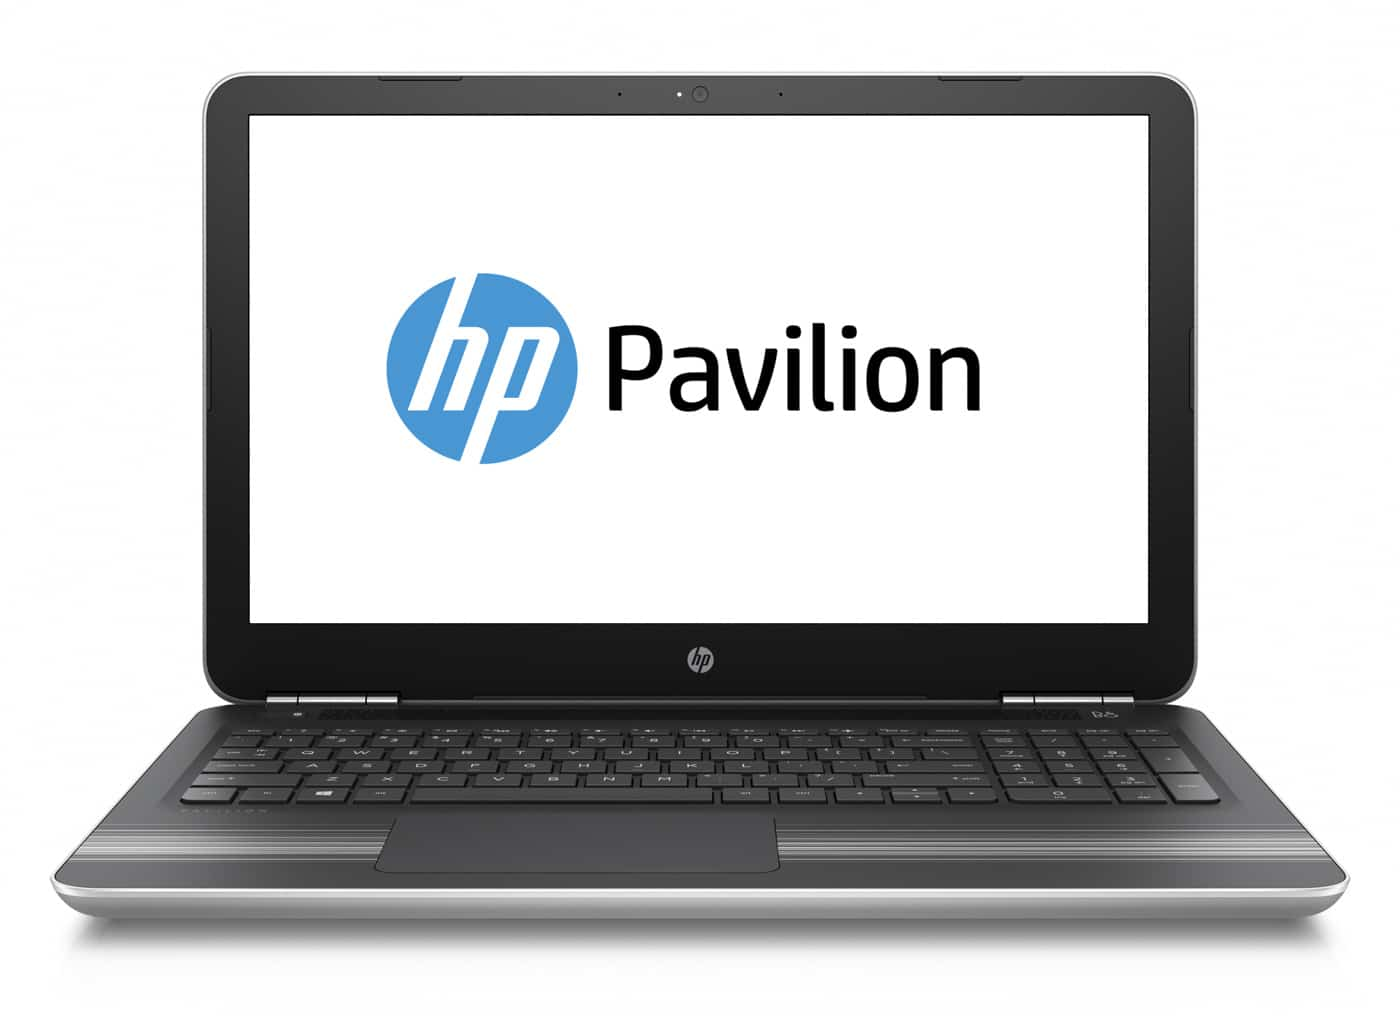 HP Pavilion 15-au099nf, PC portable 15 pouces Full HD 940MX Skylake (399€)